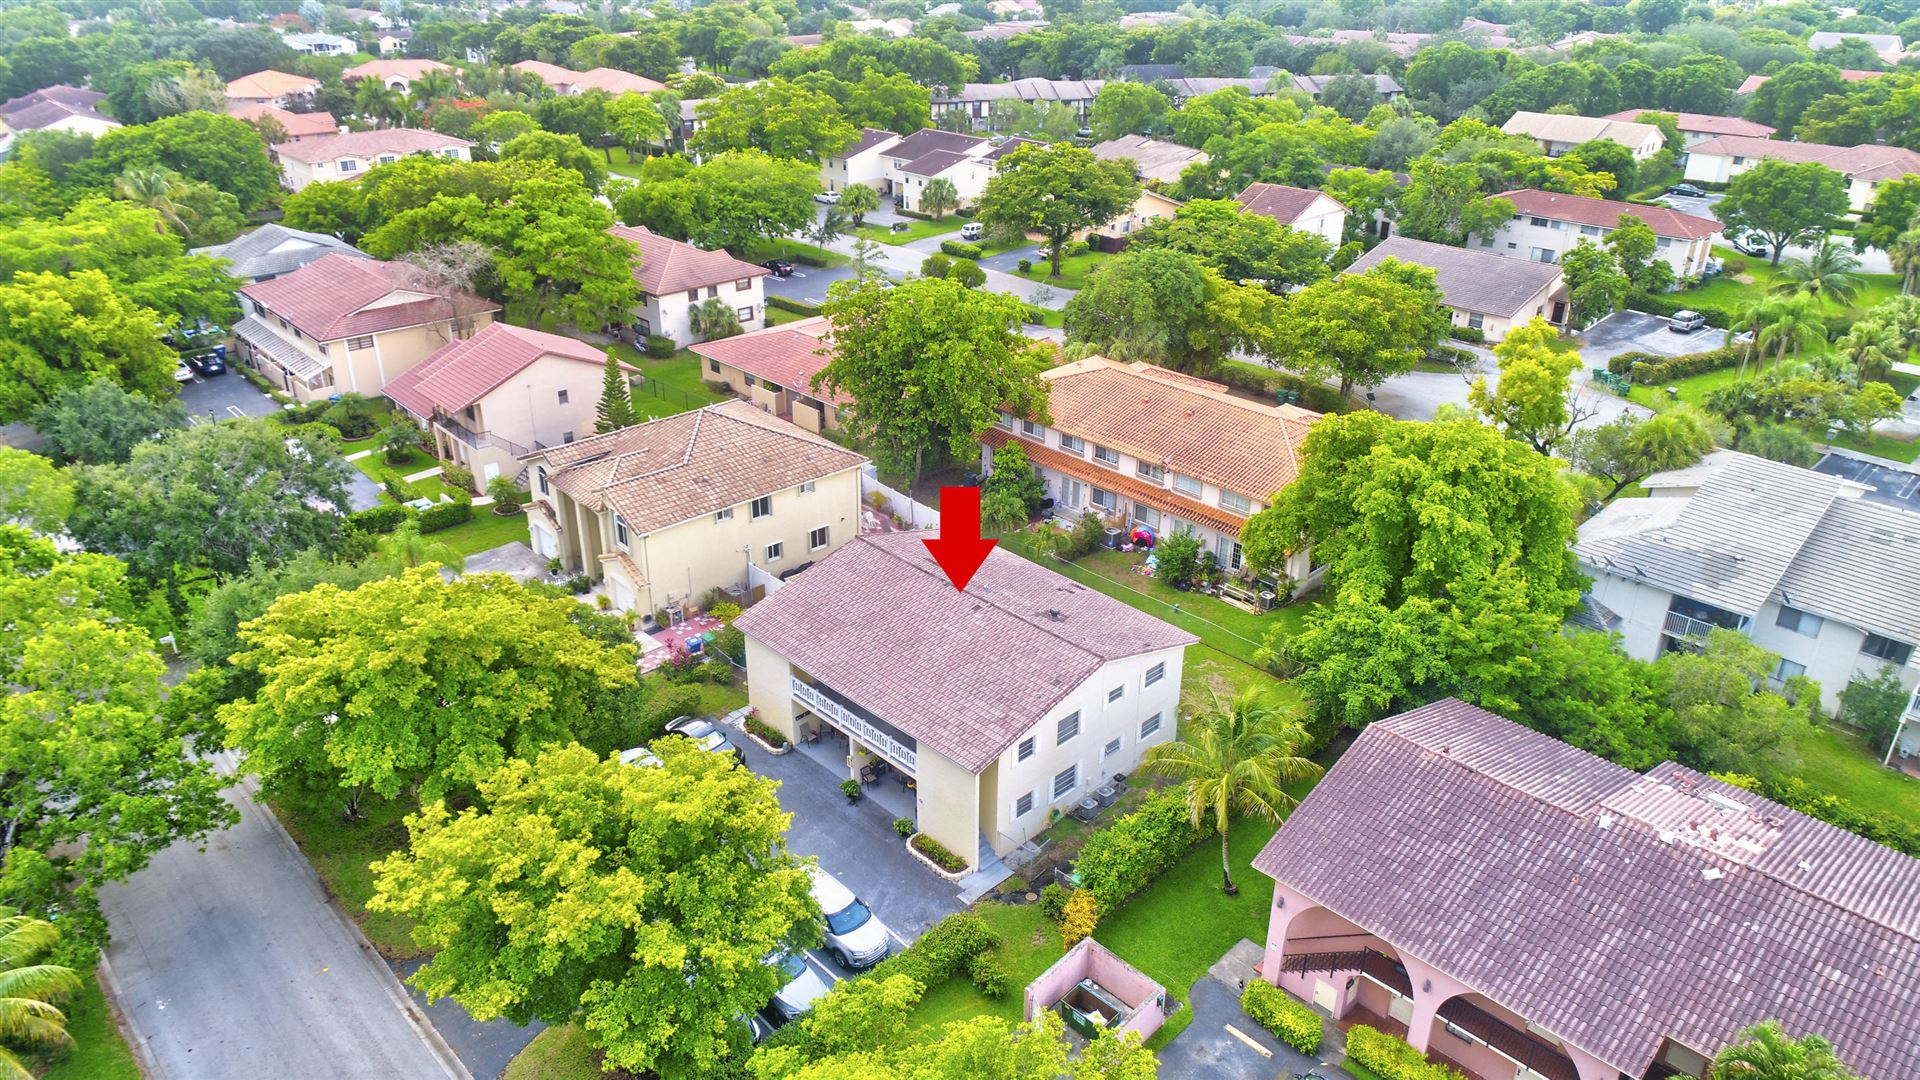 11660 NW 45 Street, Coral Springs, FL 33065 - #: RX-10627508